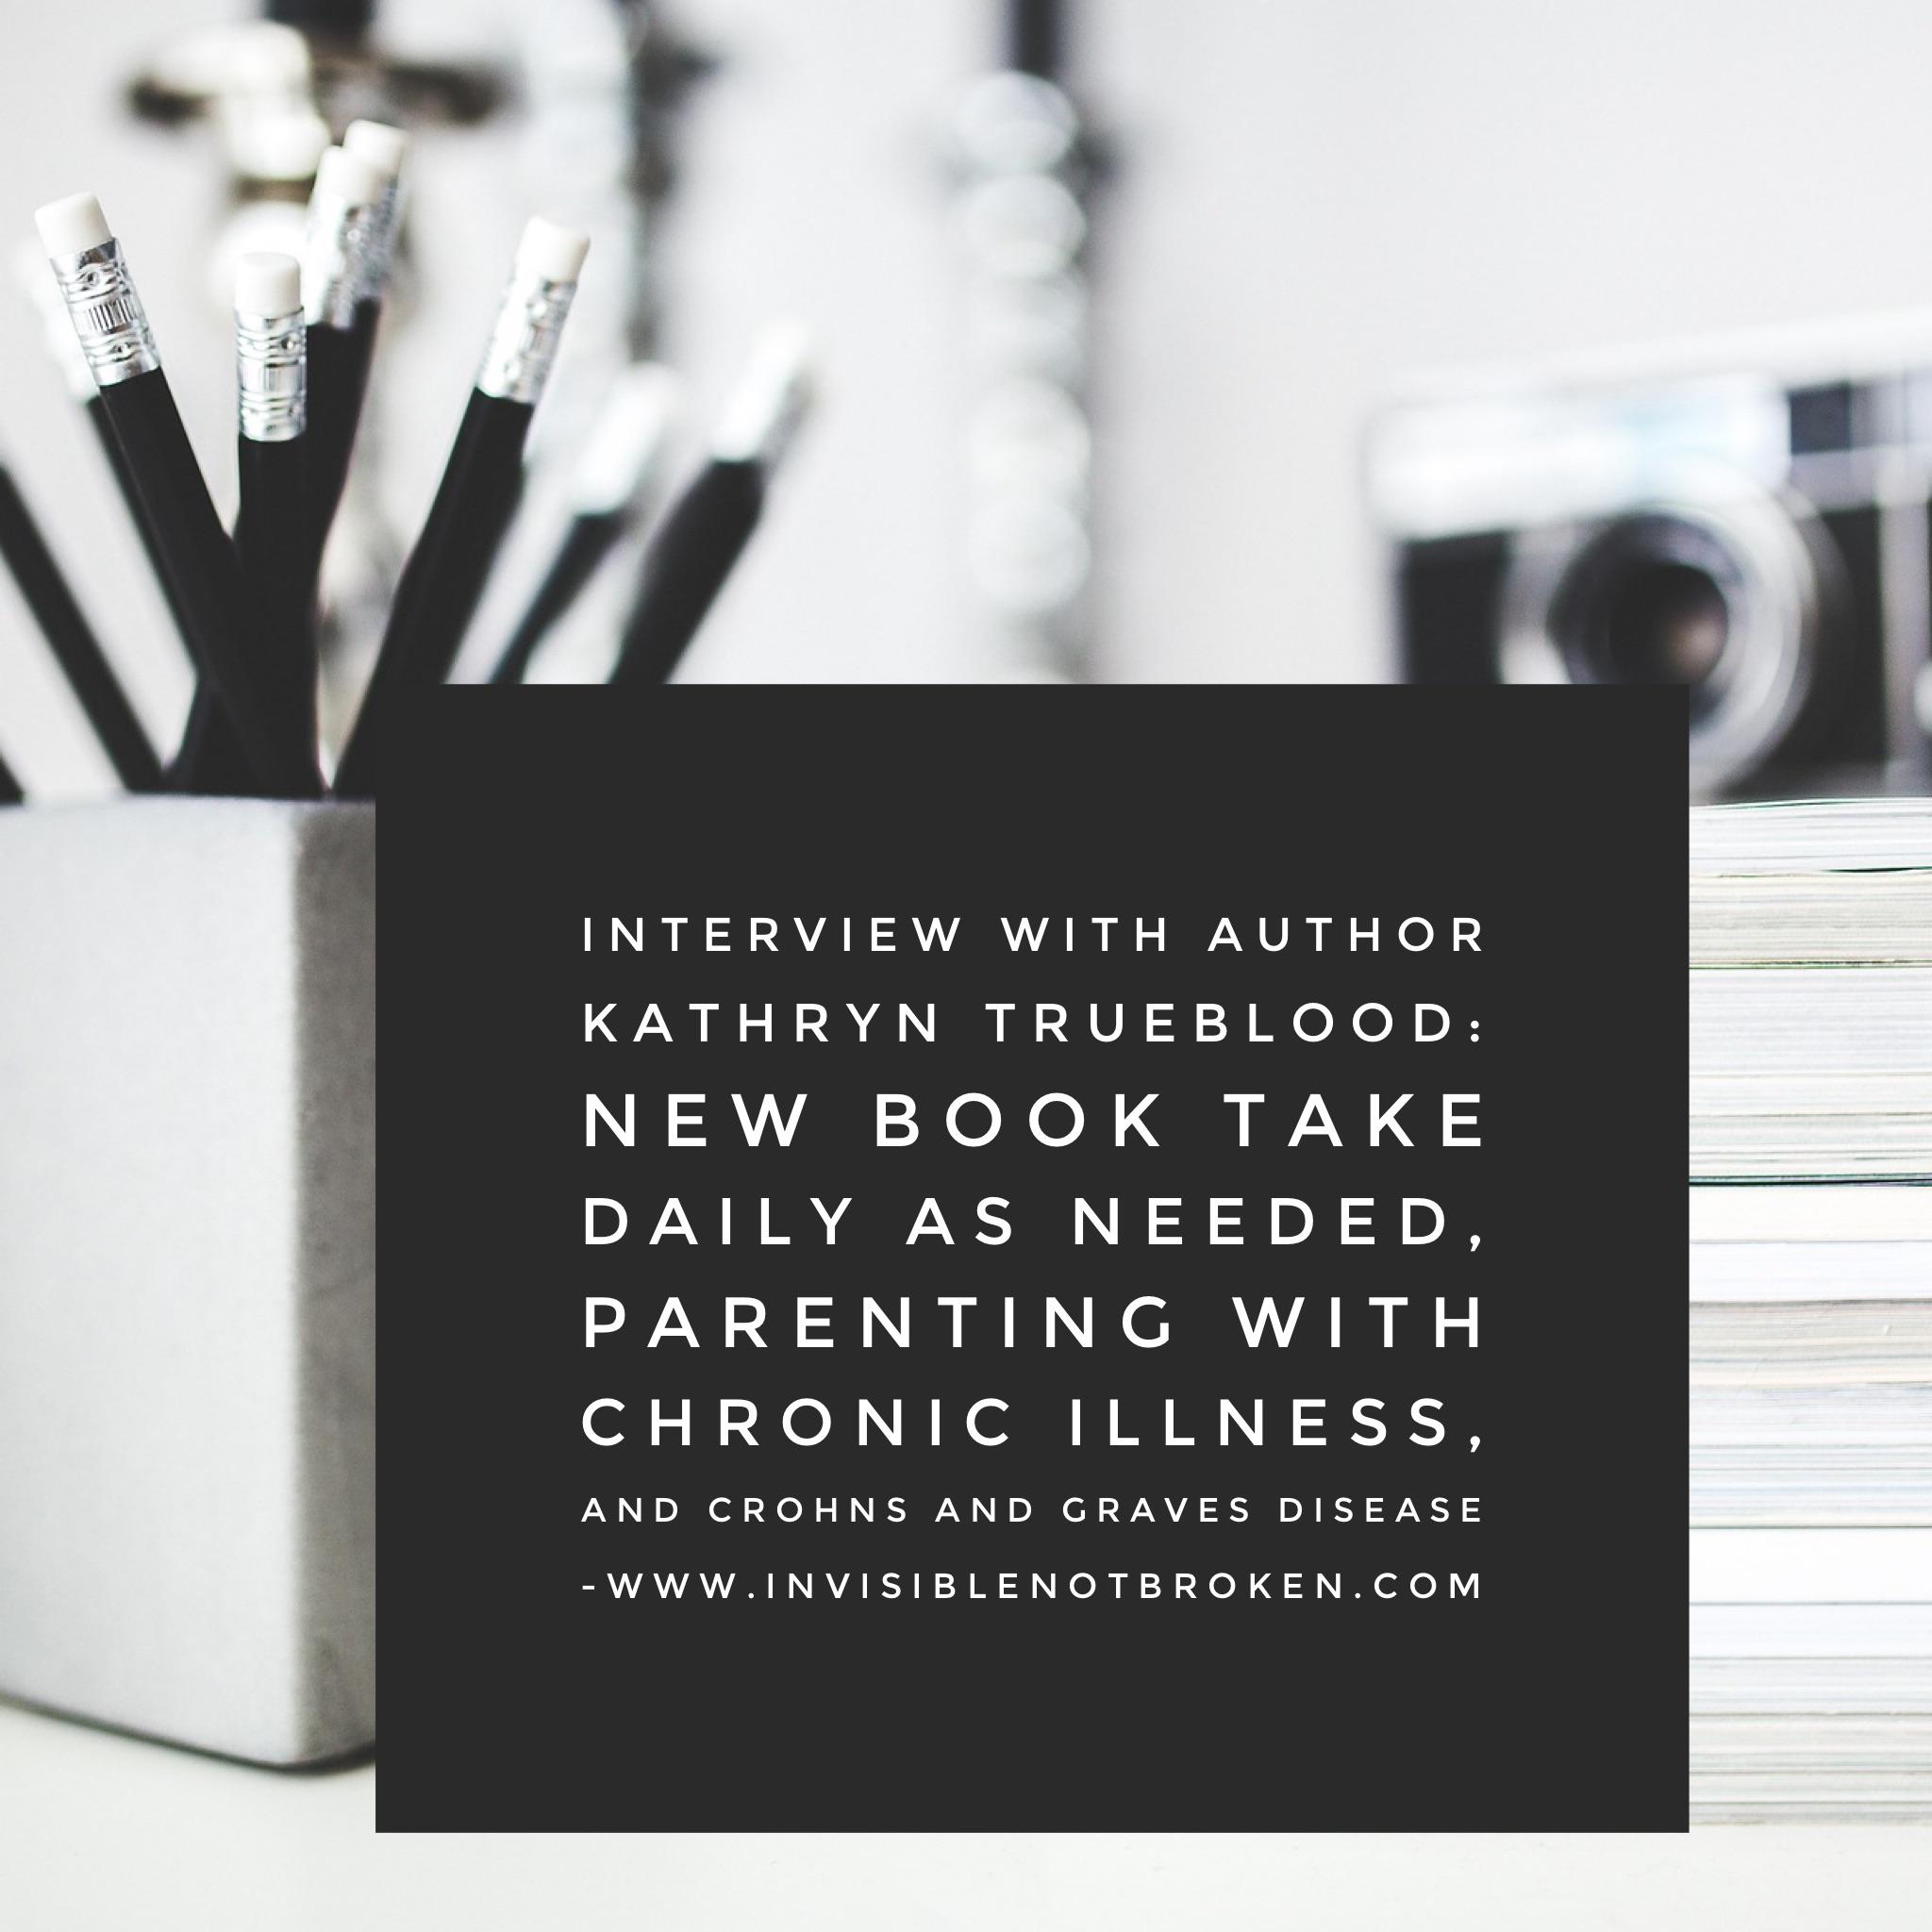 Kathryn-trueblood-Take-Daily-As-Needed-Interview-Chronic-Illness-Podcast-Invisibel-Not-Broken-Graves-Disease-Crohns-Disease-.jpg